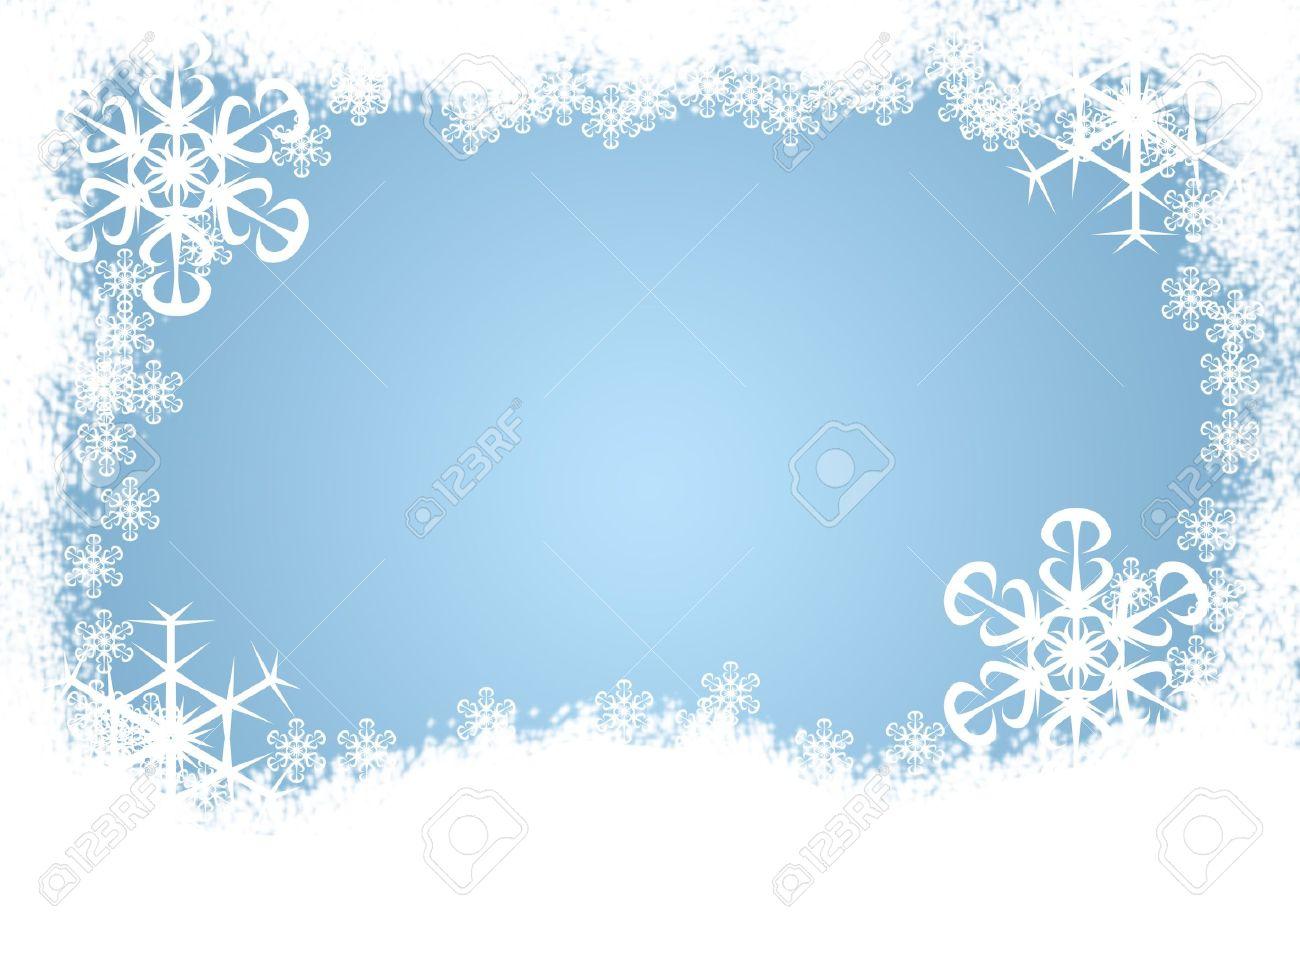 Winter Snow Borders Clipart #1-Winter Snow Borders Clipart #1-12